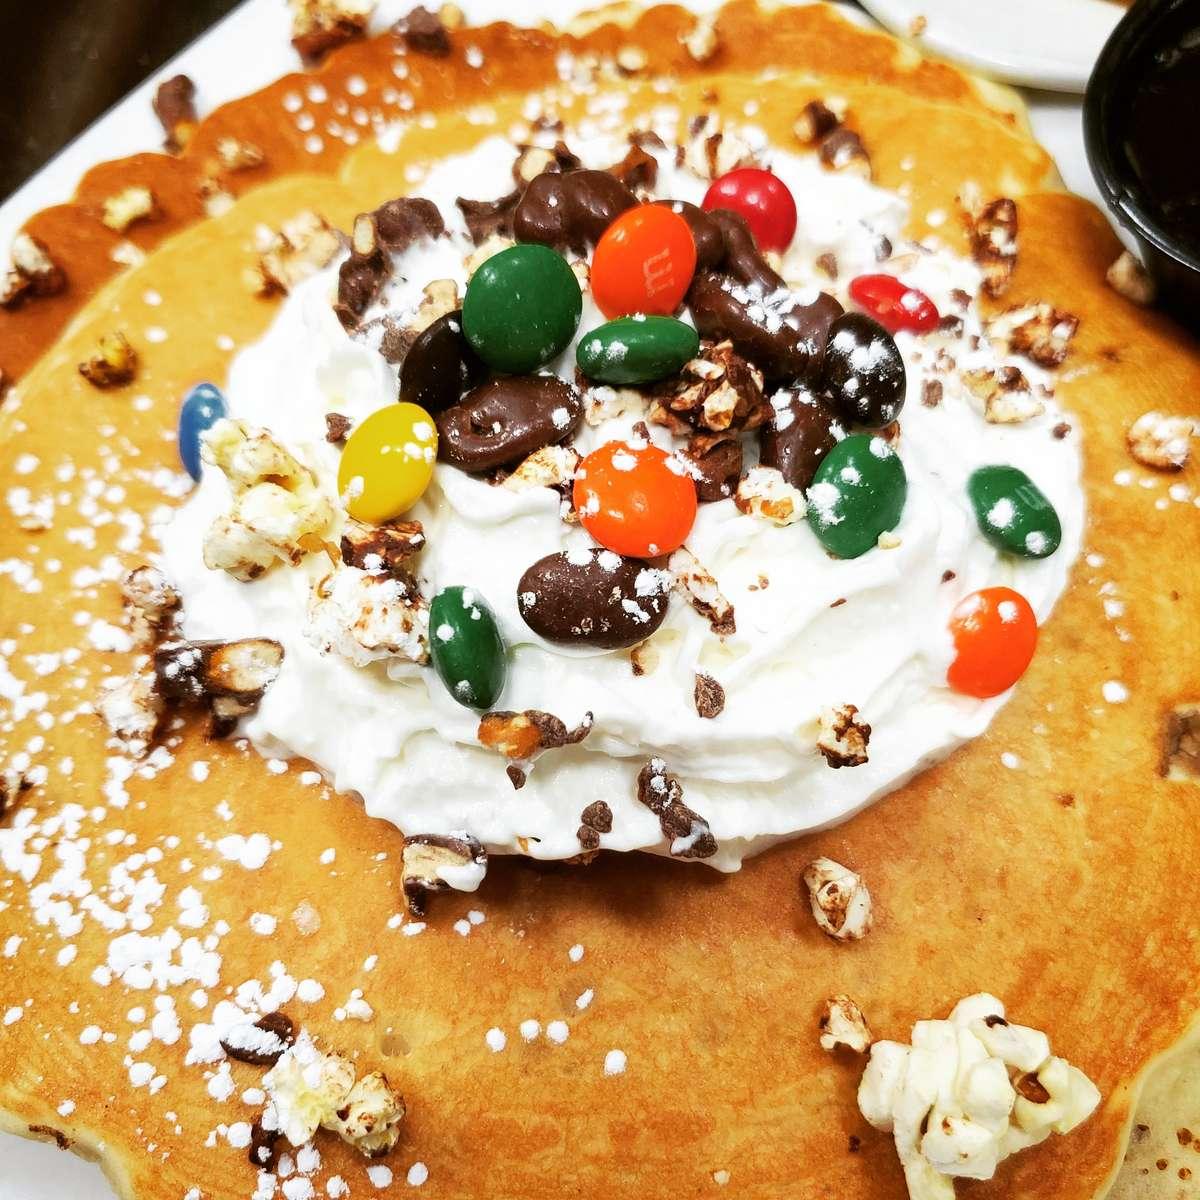 Palace Pancakes